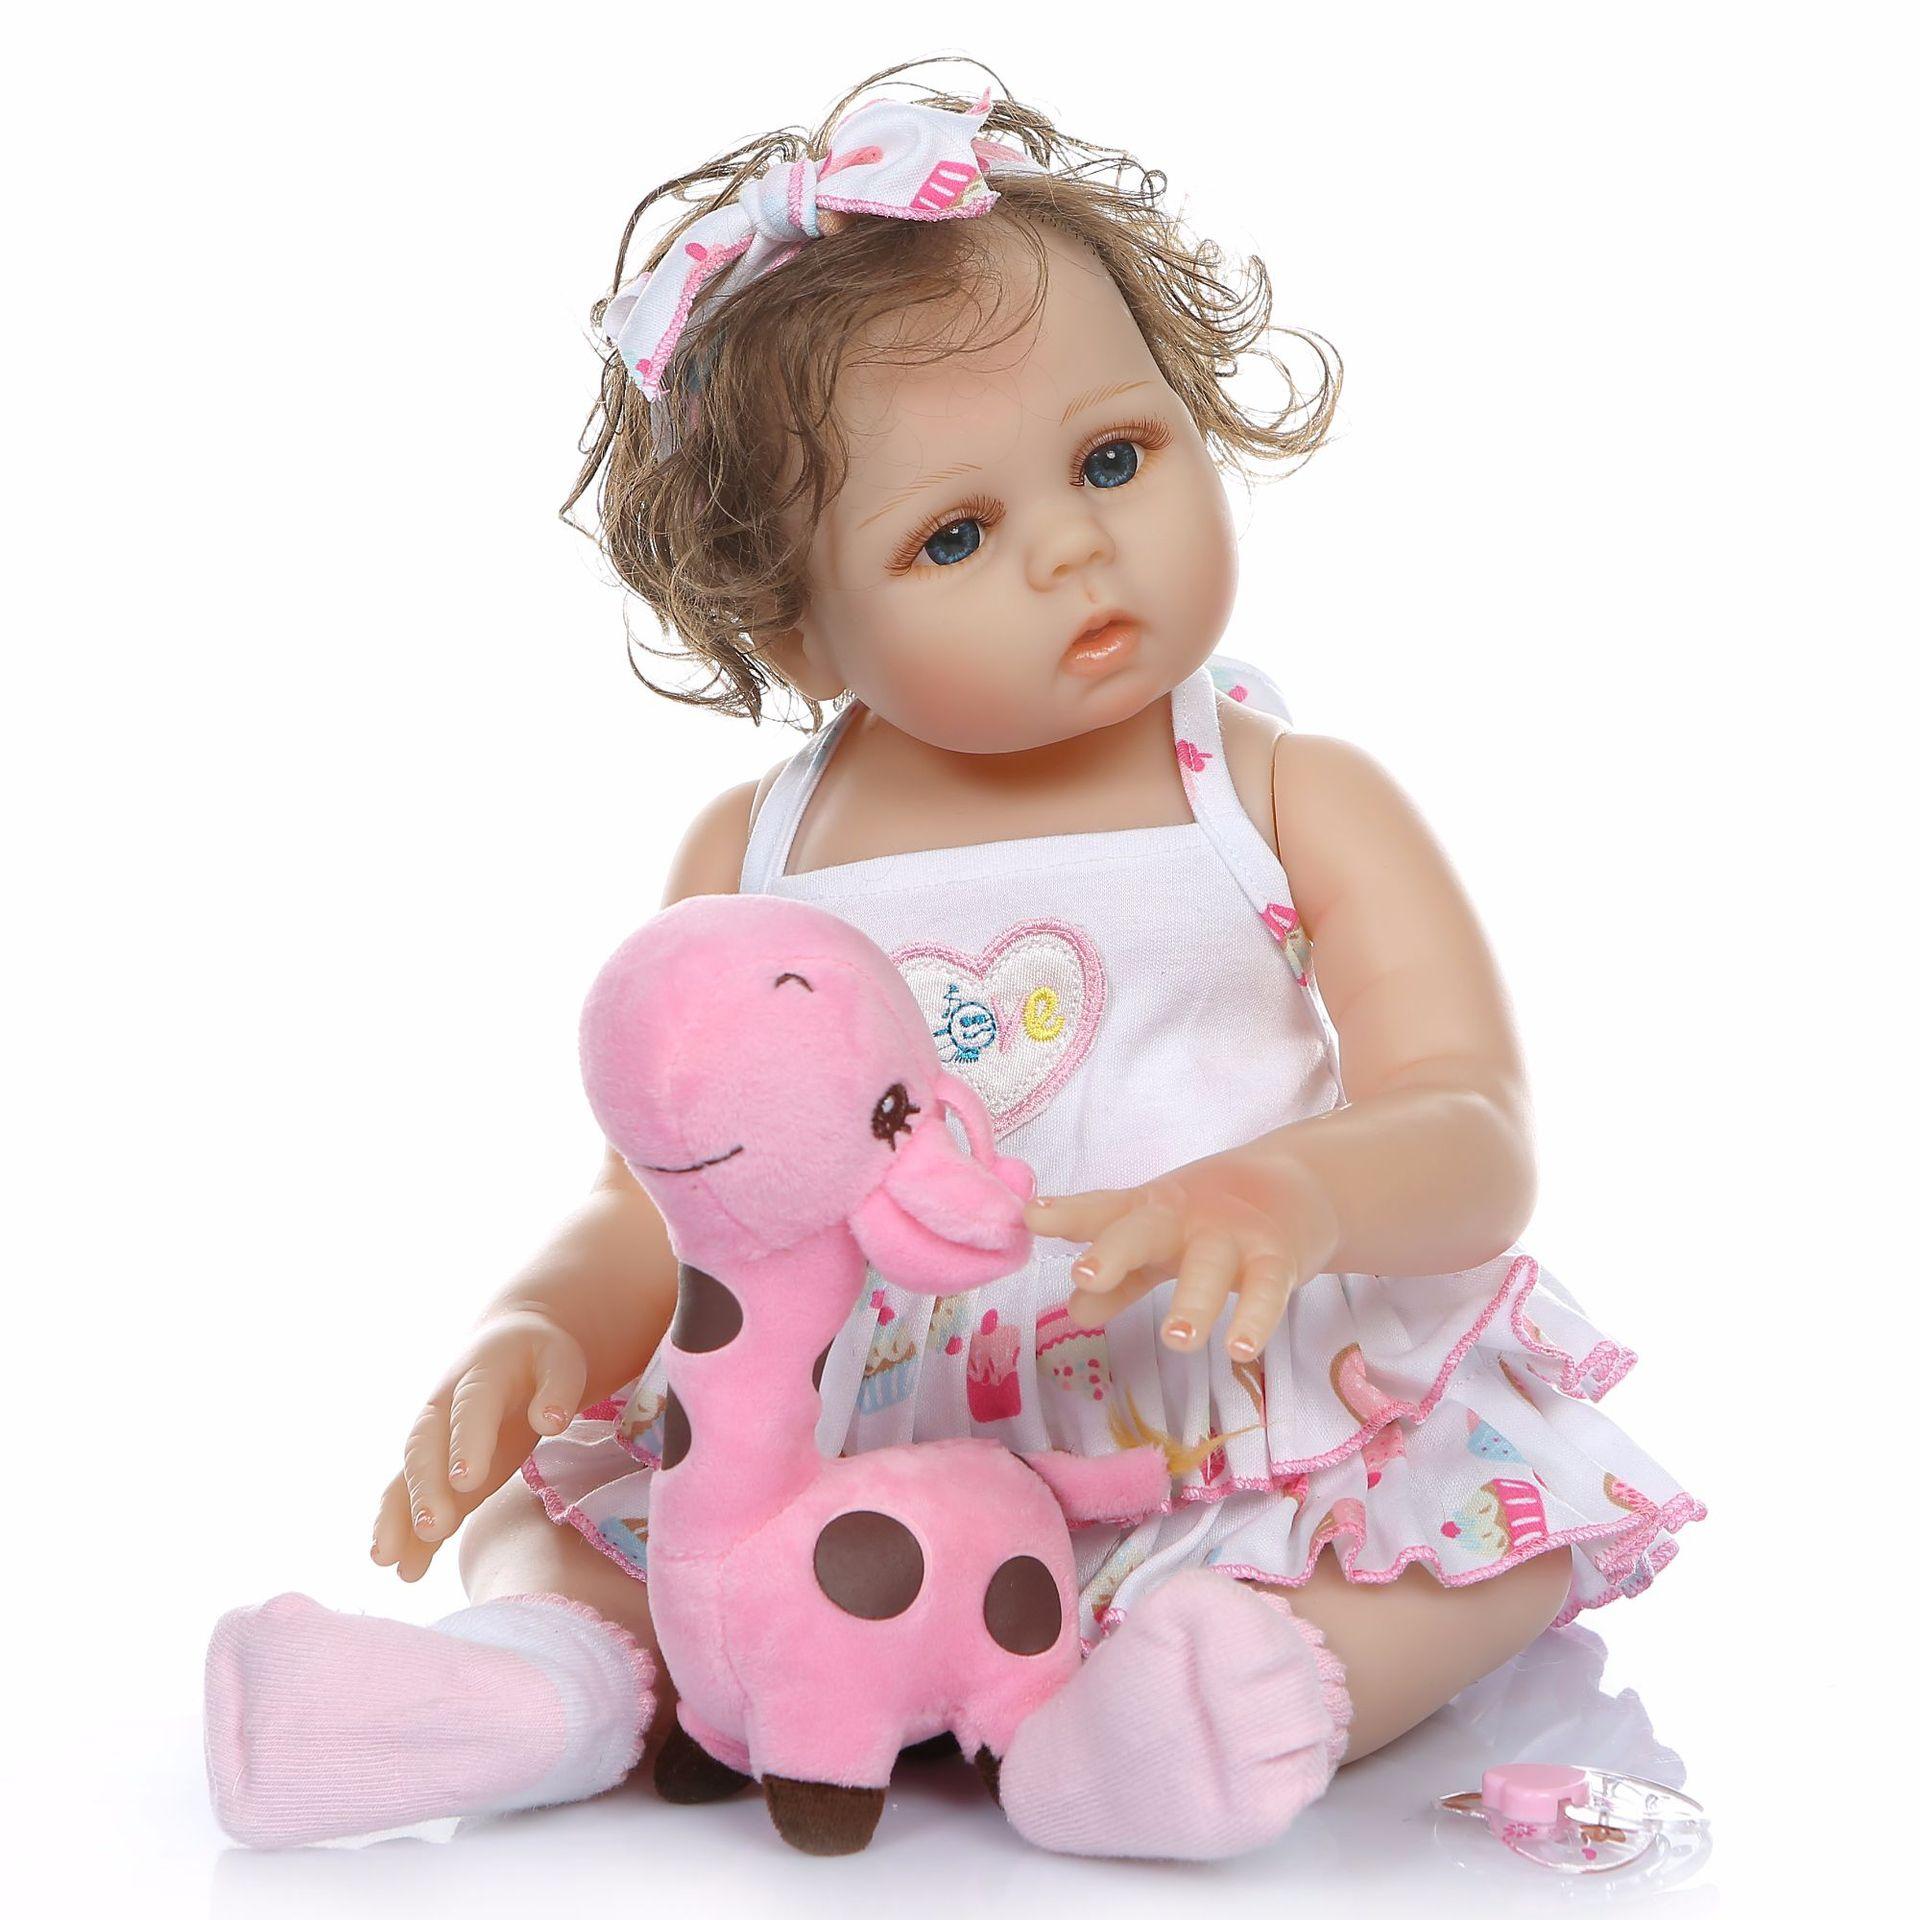 NPK Model Infant Full Rubber Doll Cute Facial Form-Bath Silicone Toy GIRL'S Birthday Gift